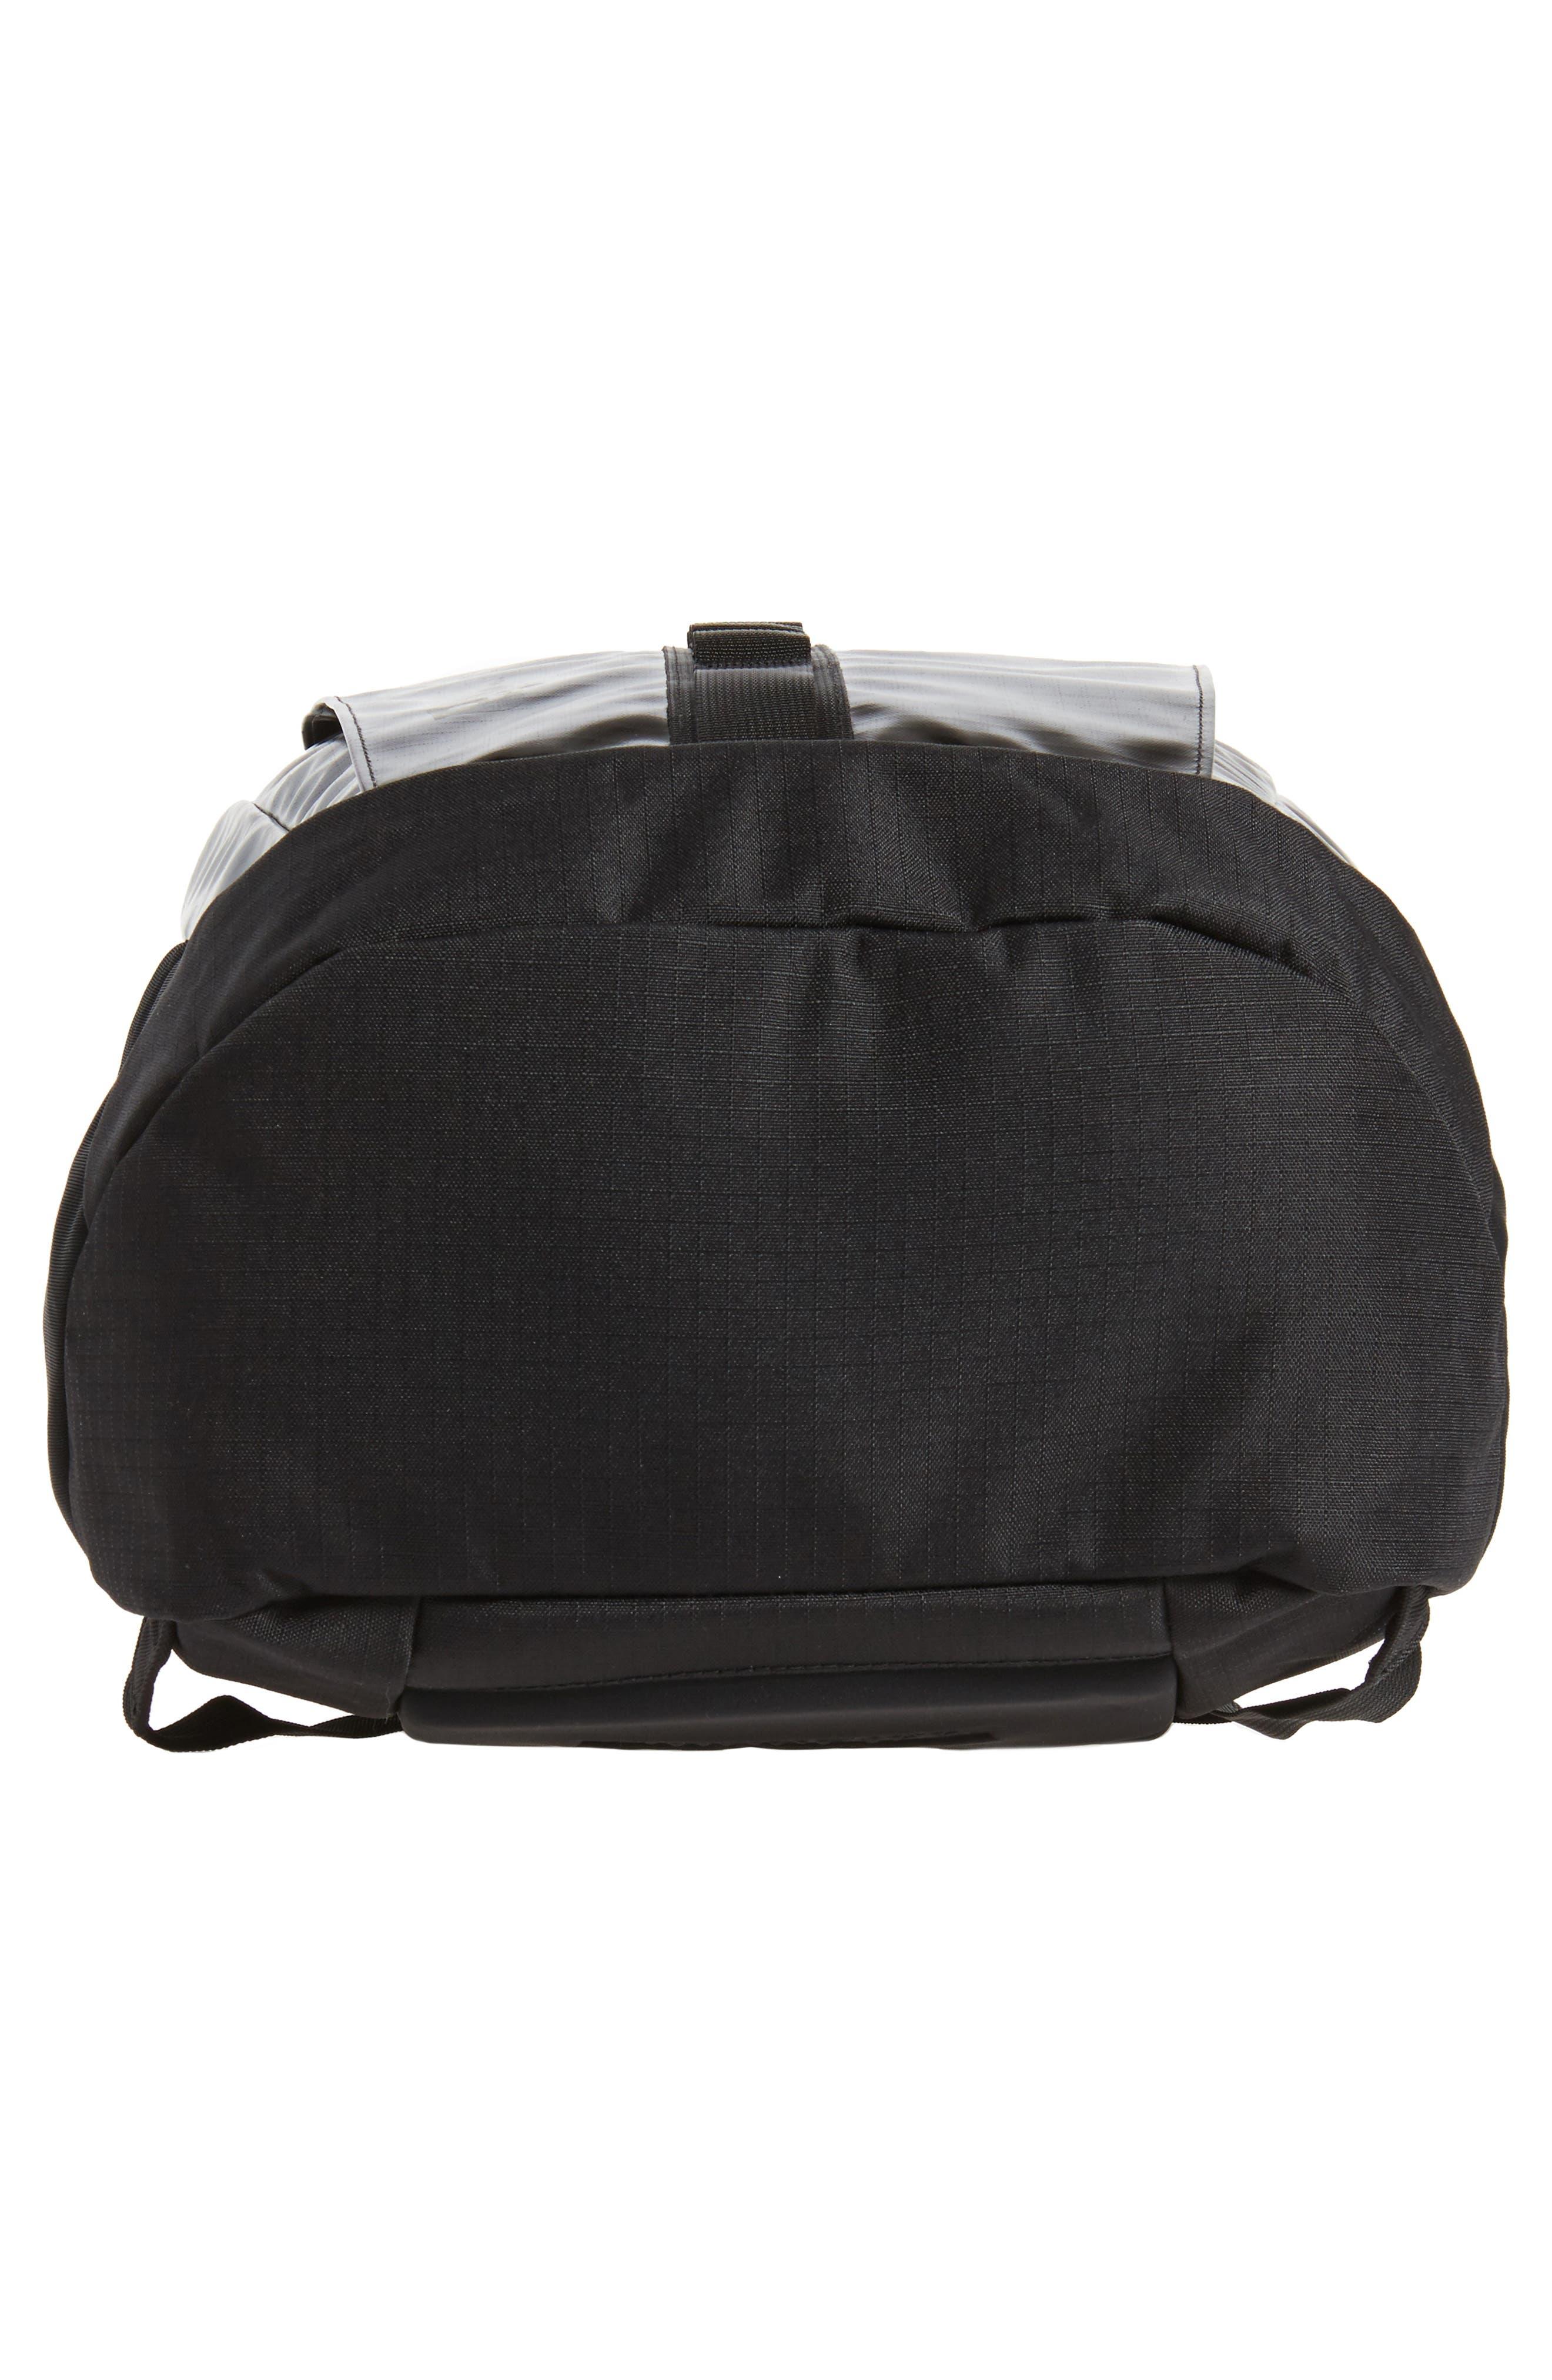 Black Hole 25 Liter Backpack,                             Alternate thumbnail 6, color,                             Black